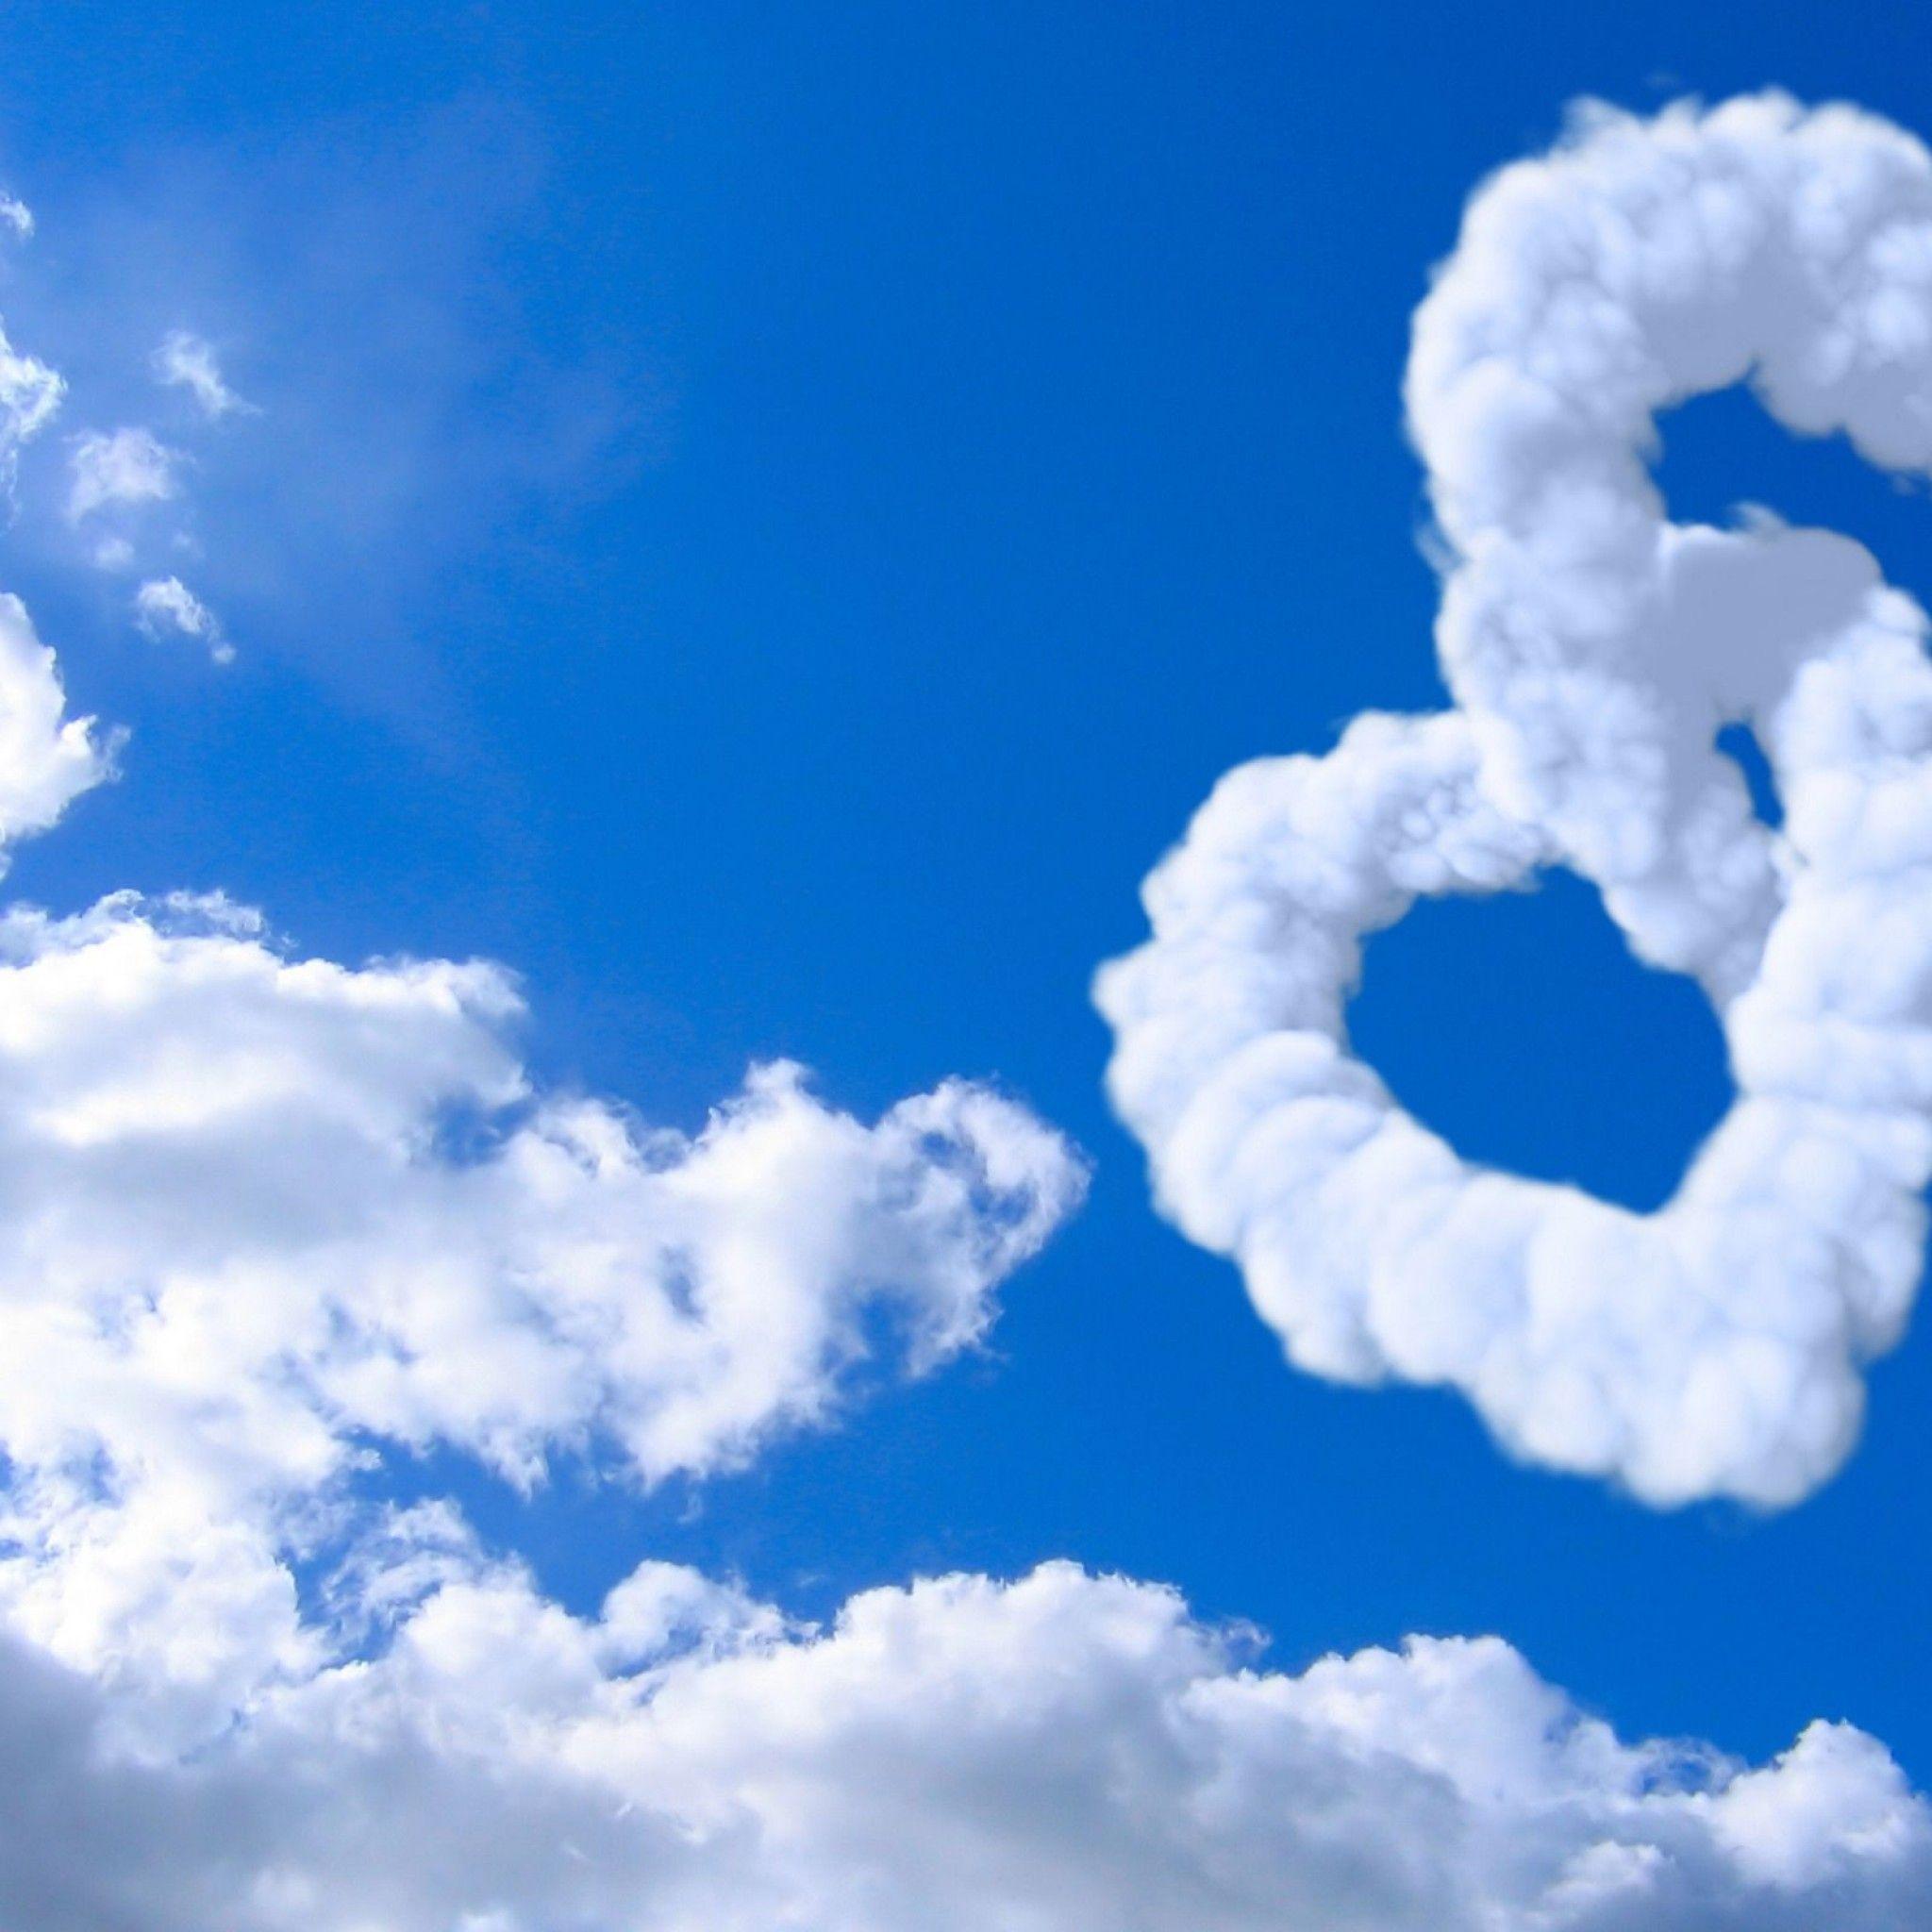 Love Heart Clouds In Blue Sky Heart February S #13790 Wallpaper ...